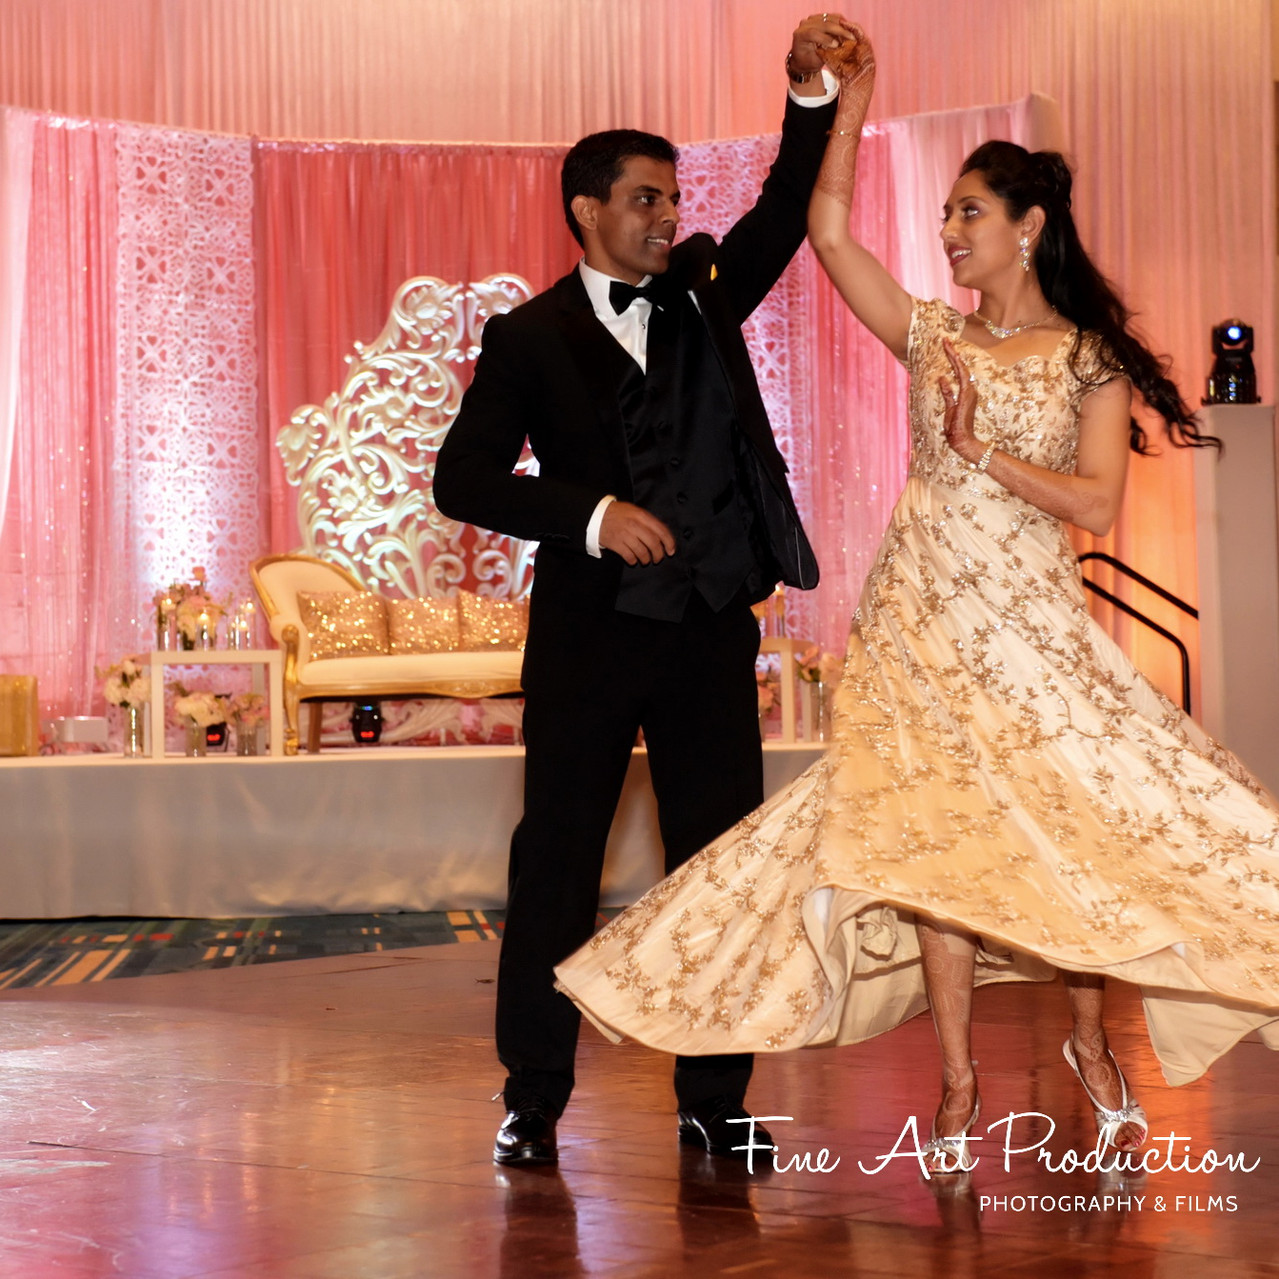 Hyatt-Regency-Grand-Cypress-Indian-Wedding-Reception-Photography-Fine-Art-Production-Amish-Thakkar_23